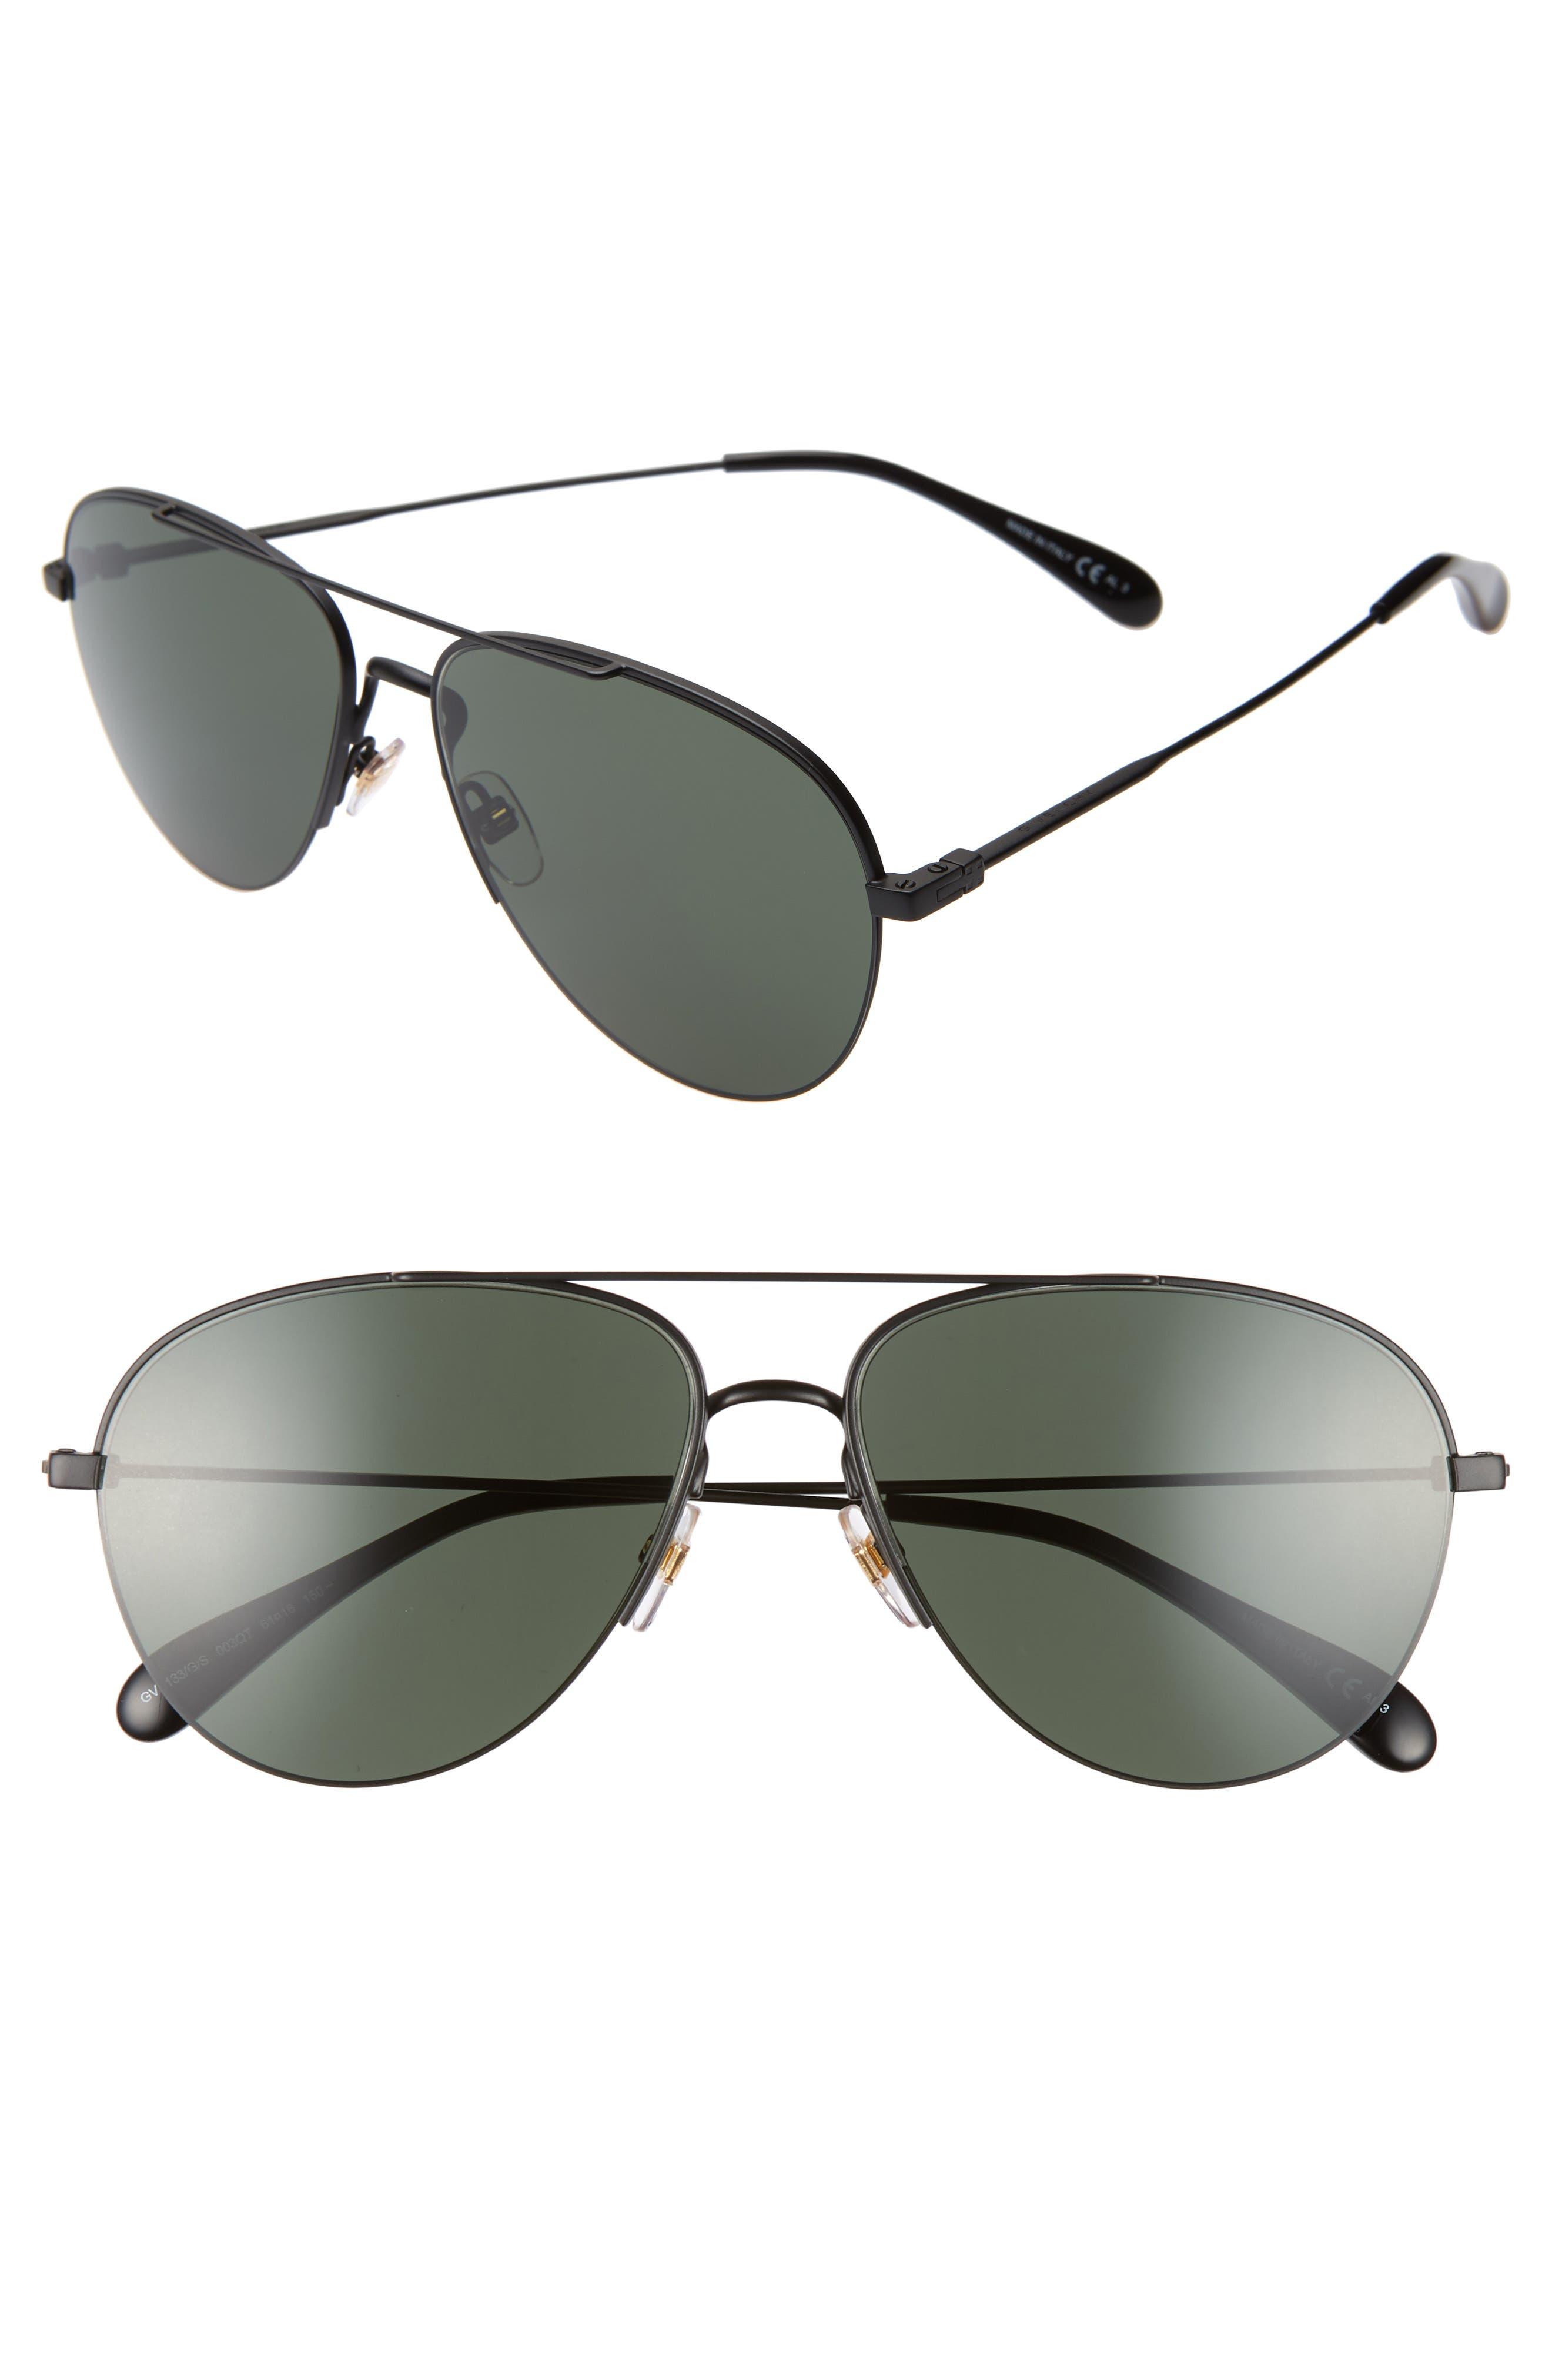 GIVENCHY,                             61mm Aviator Sunglasses,                             Main thumbnail 1, color,                             MATTE BLACK